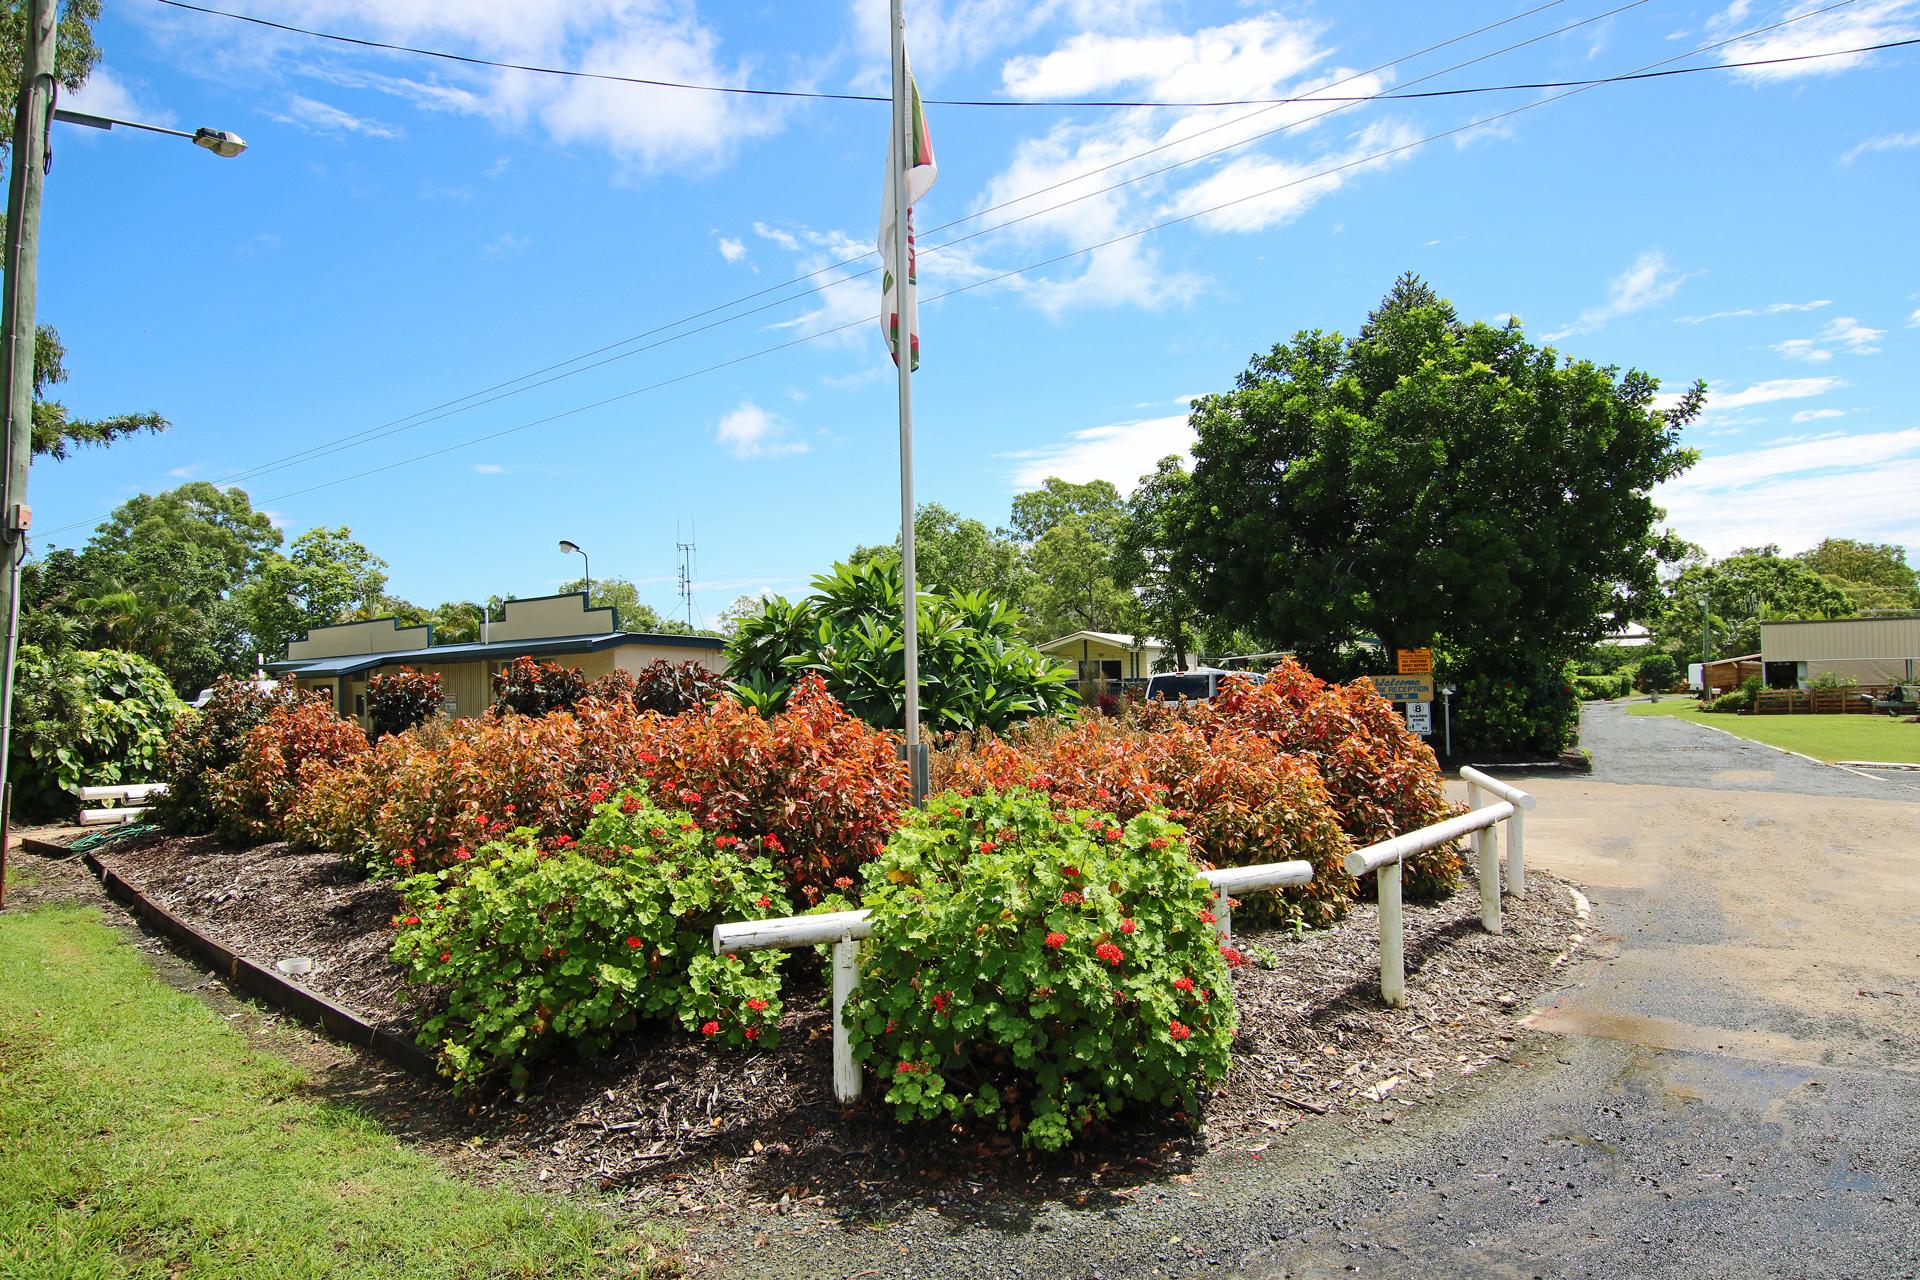 f - Burrum River Caravan Park